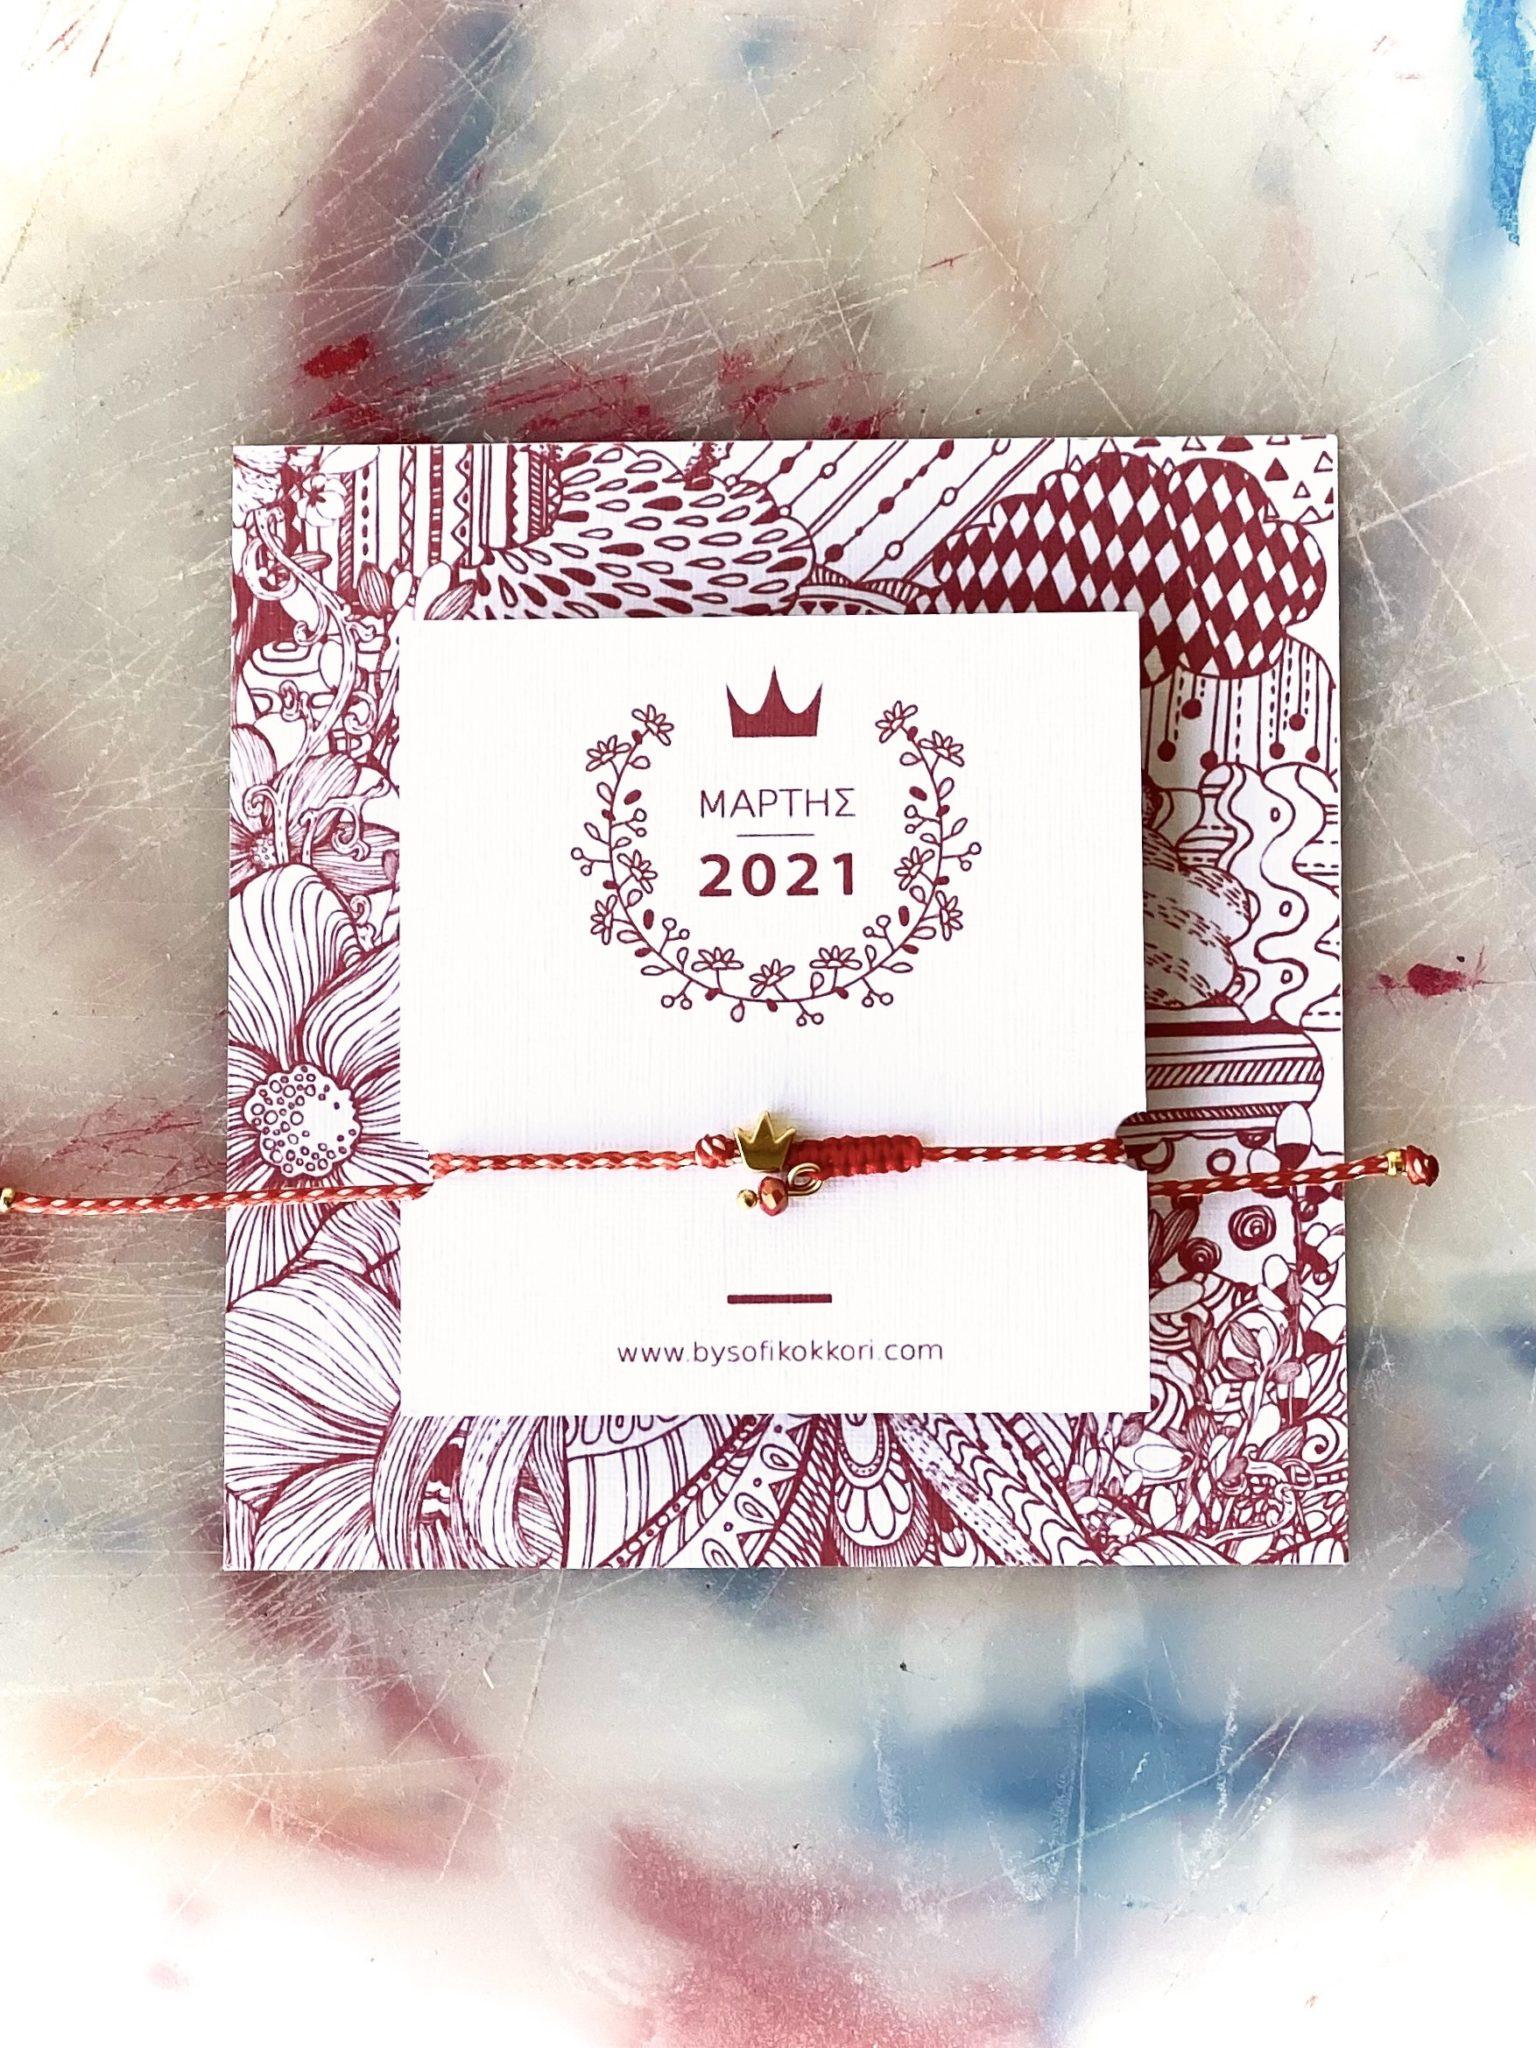 Martis-2021-special-occasion-crown-bracelet-macrame-red